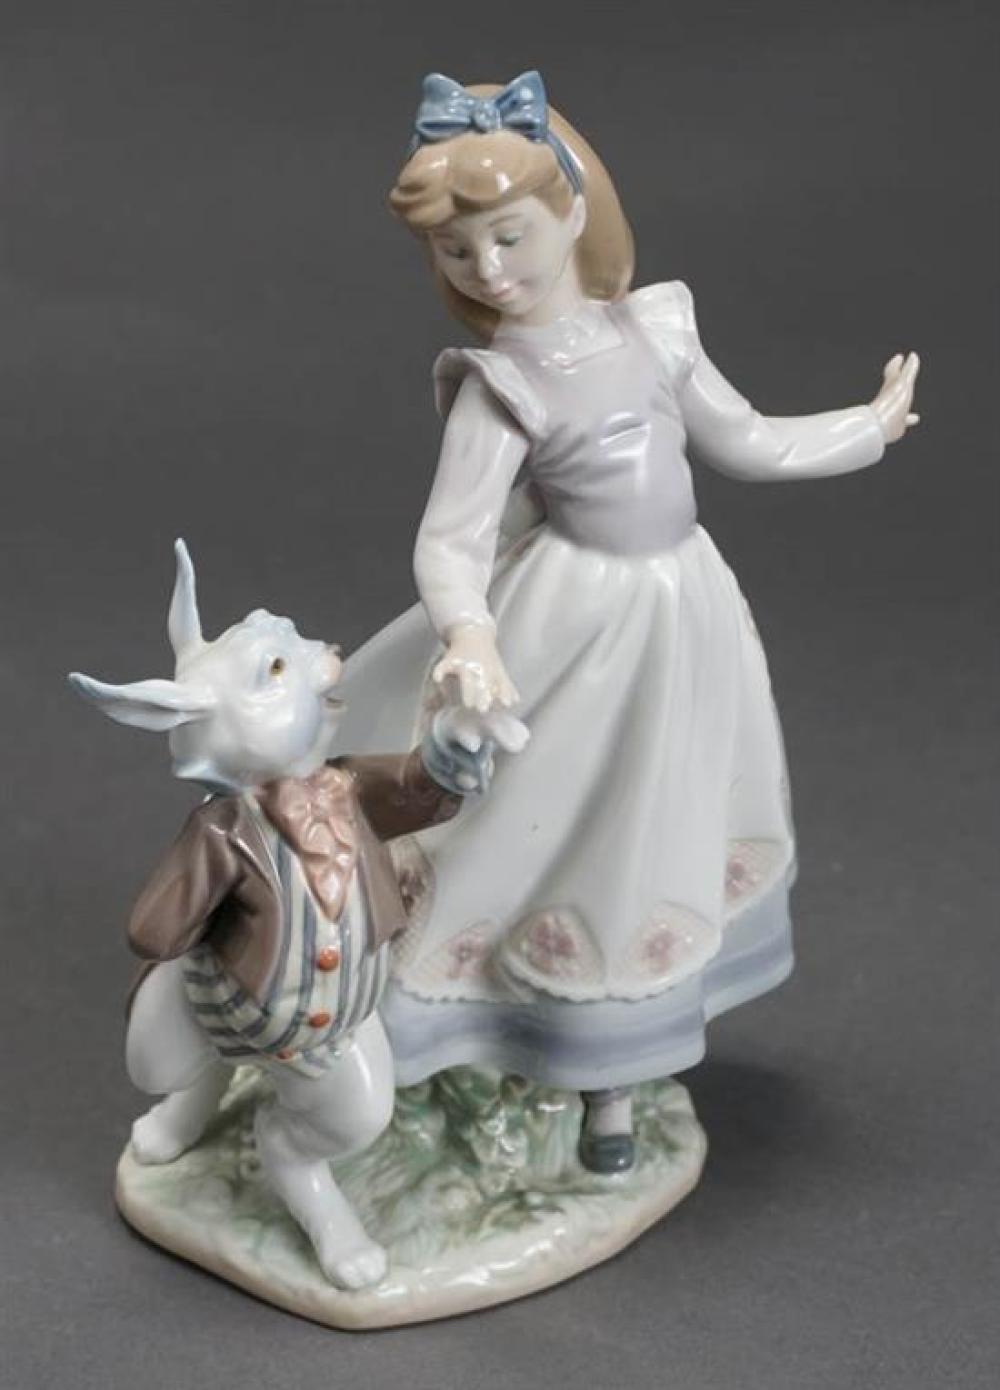 Lladró Figure of 'Alice in Wonderland' Post 1950